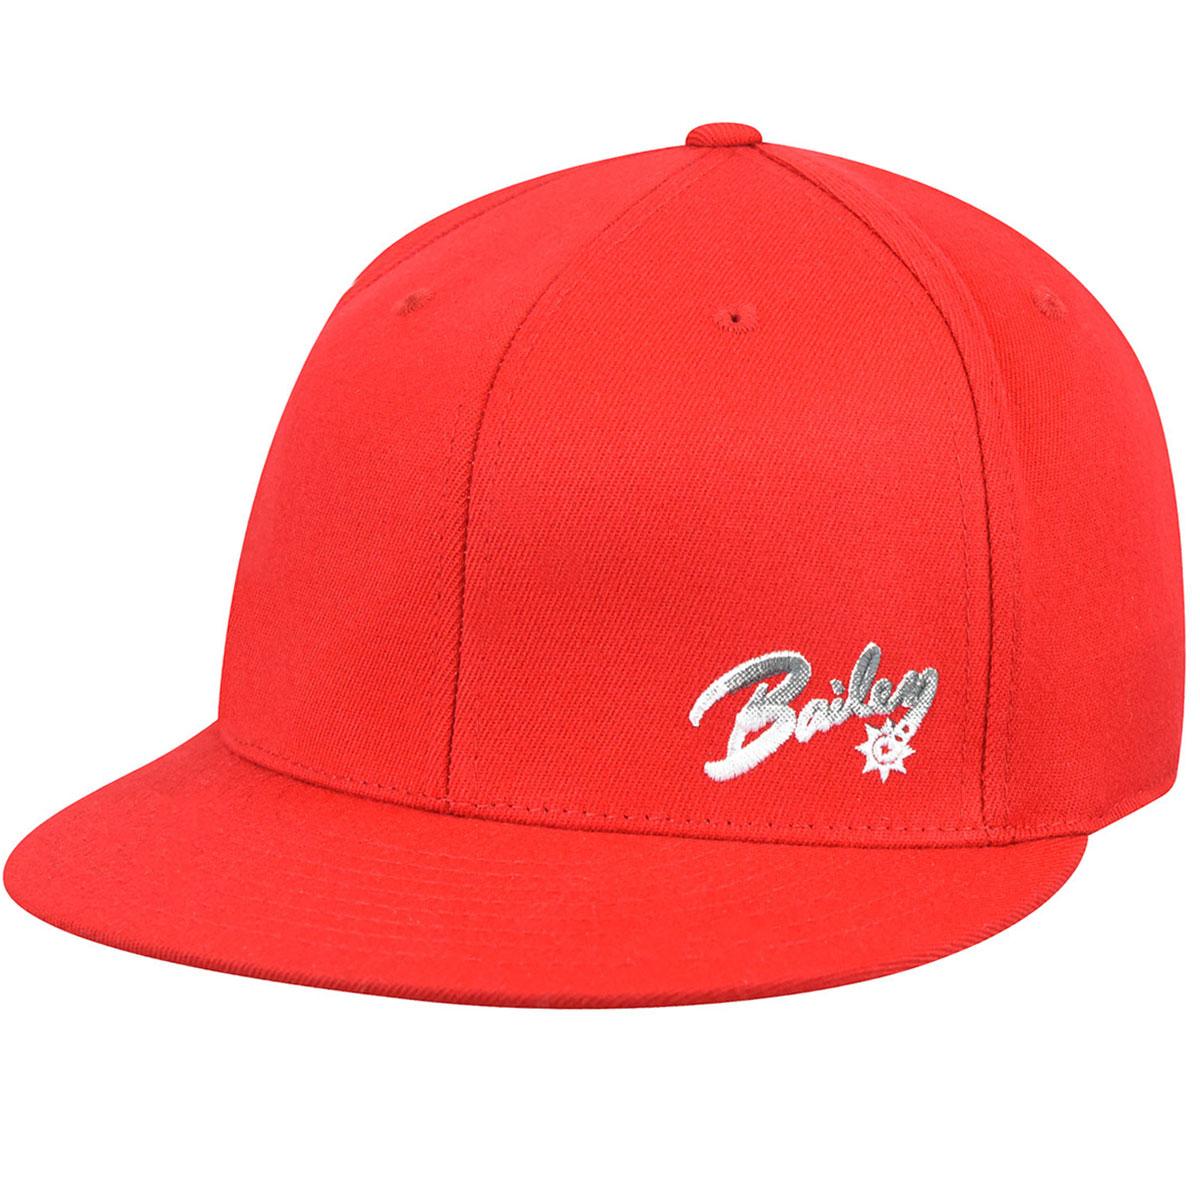 Logo Baseball Cap - Orig. $26.00